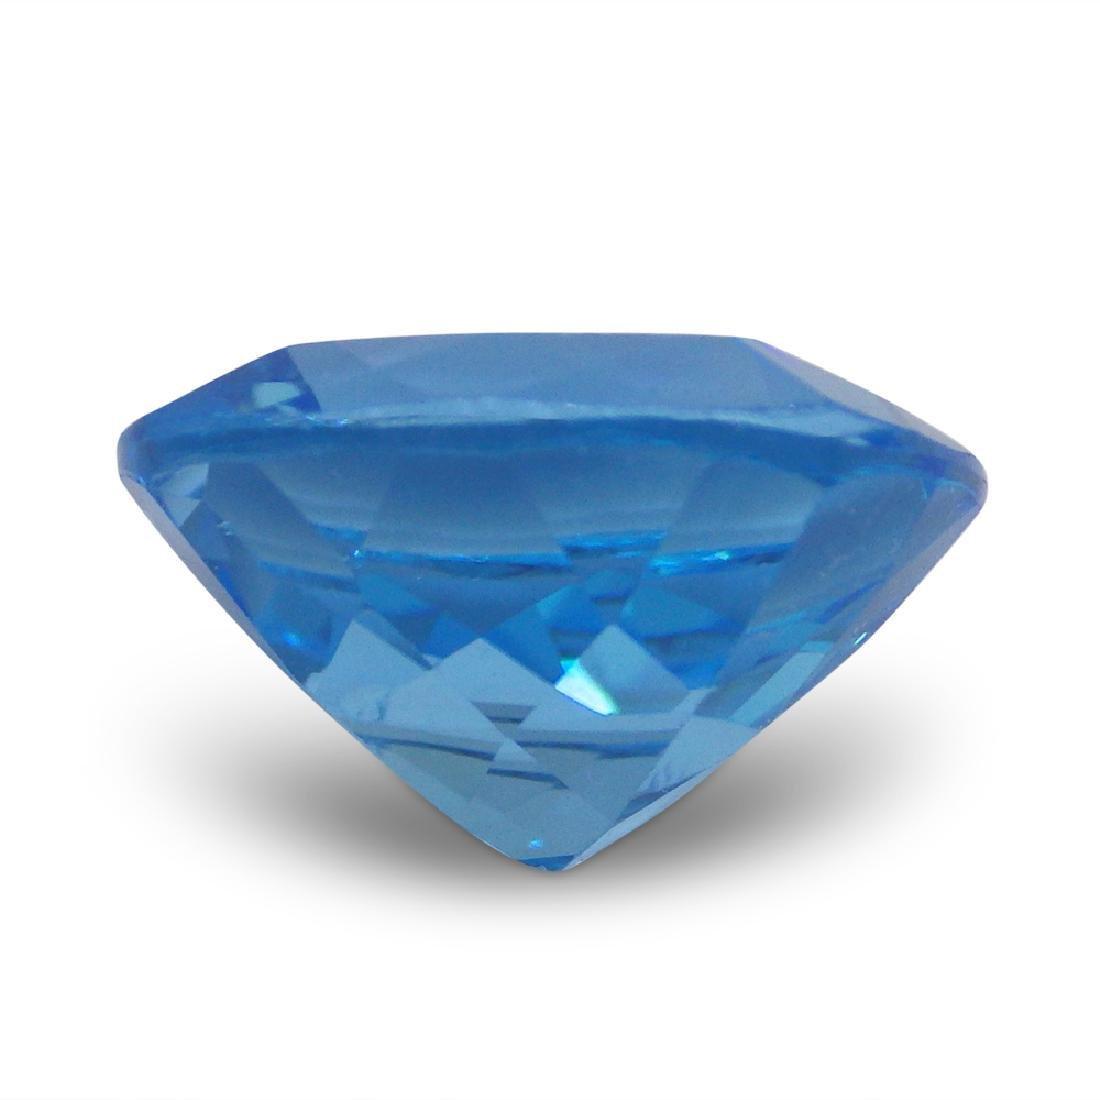 15.13 Carat Loose Cushion Blue Topaz - 6